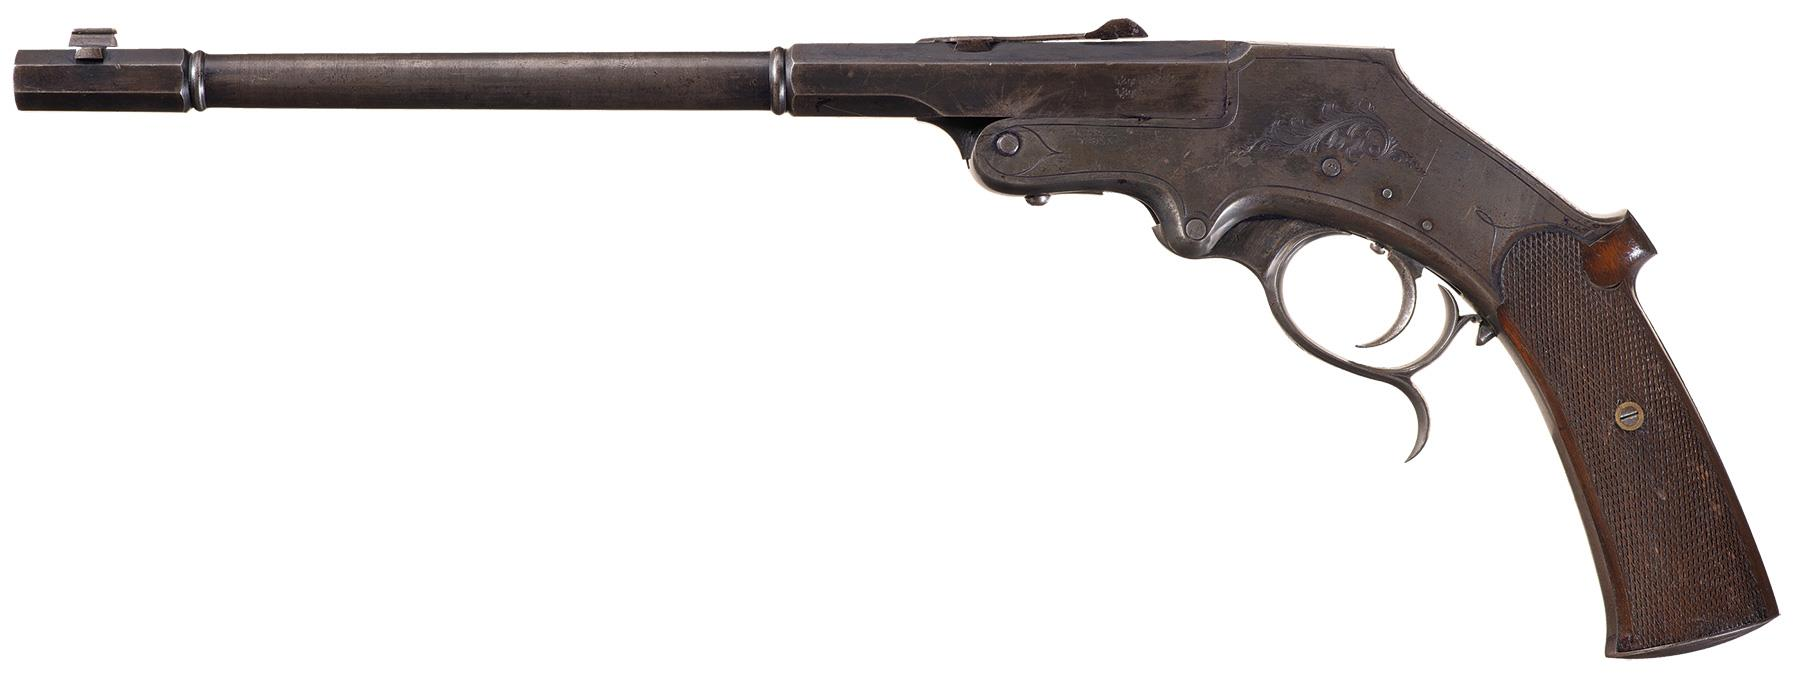 This Langenham Free Pistol is marked J.H. HAMPE, GETTINGEN.